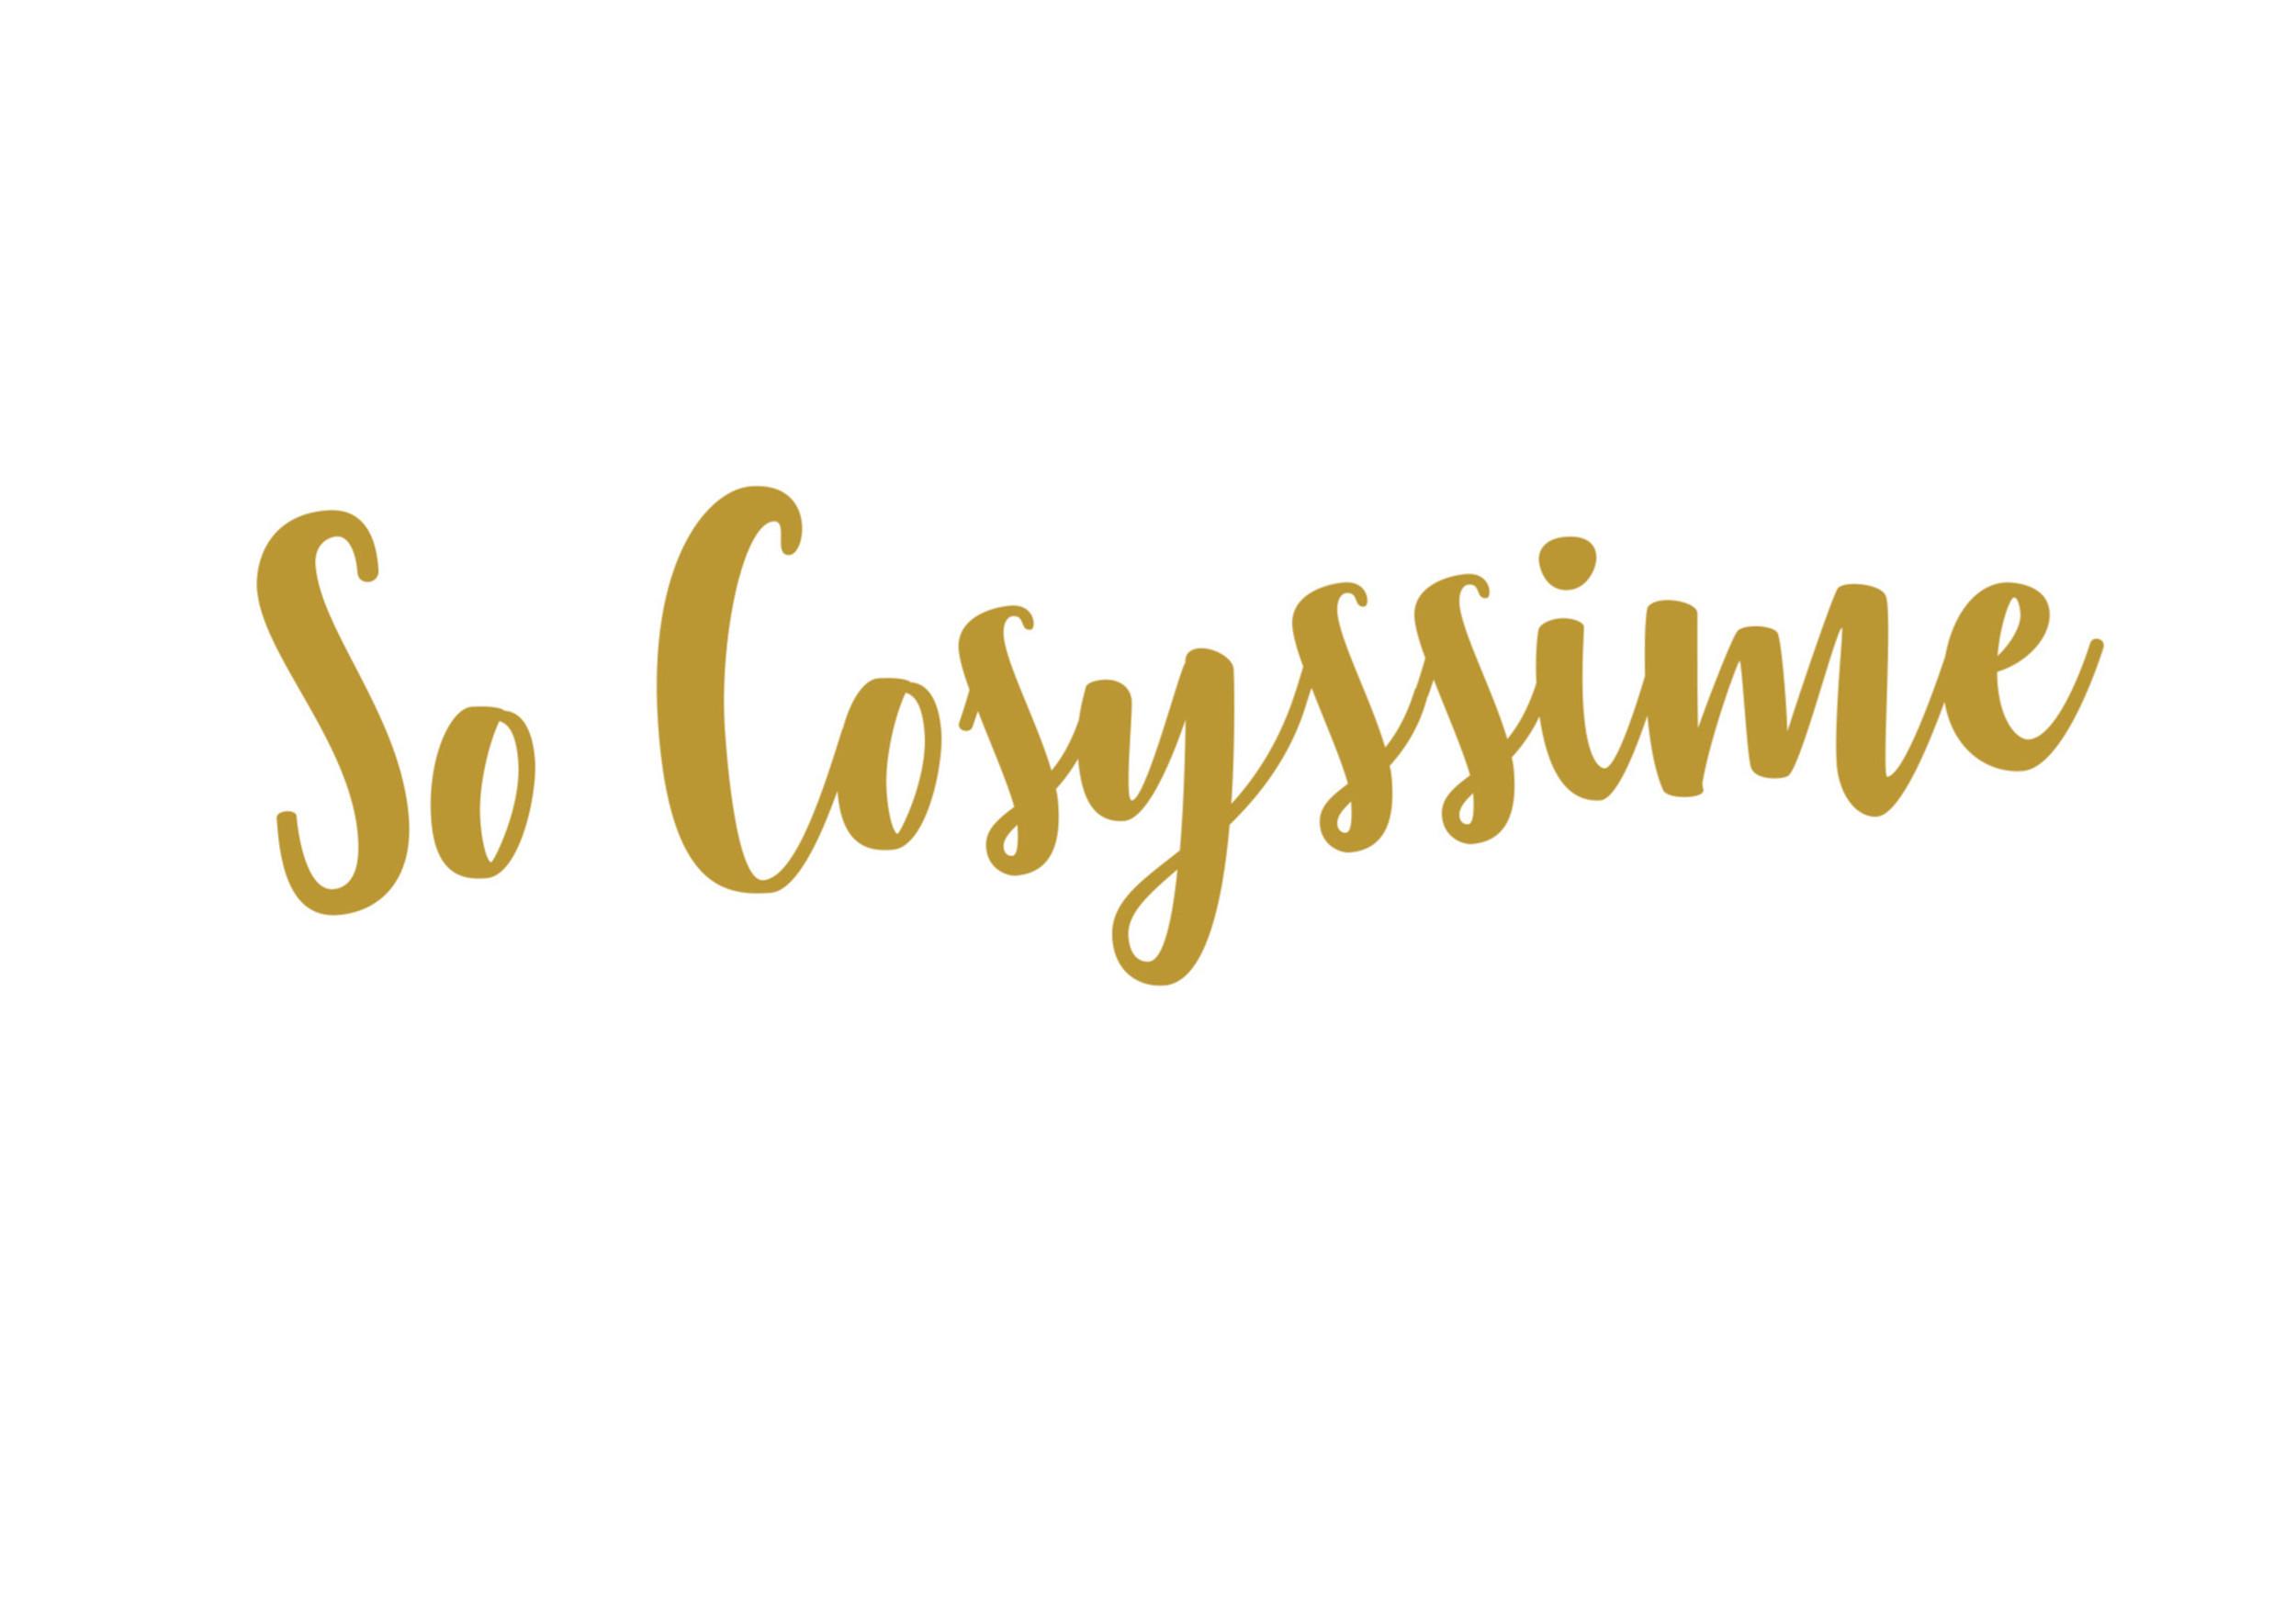 etsy-logo-600x172.png